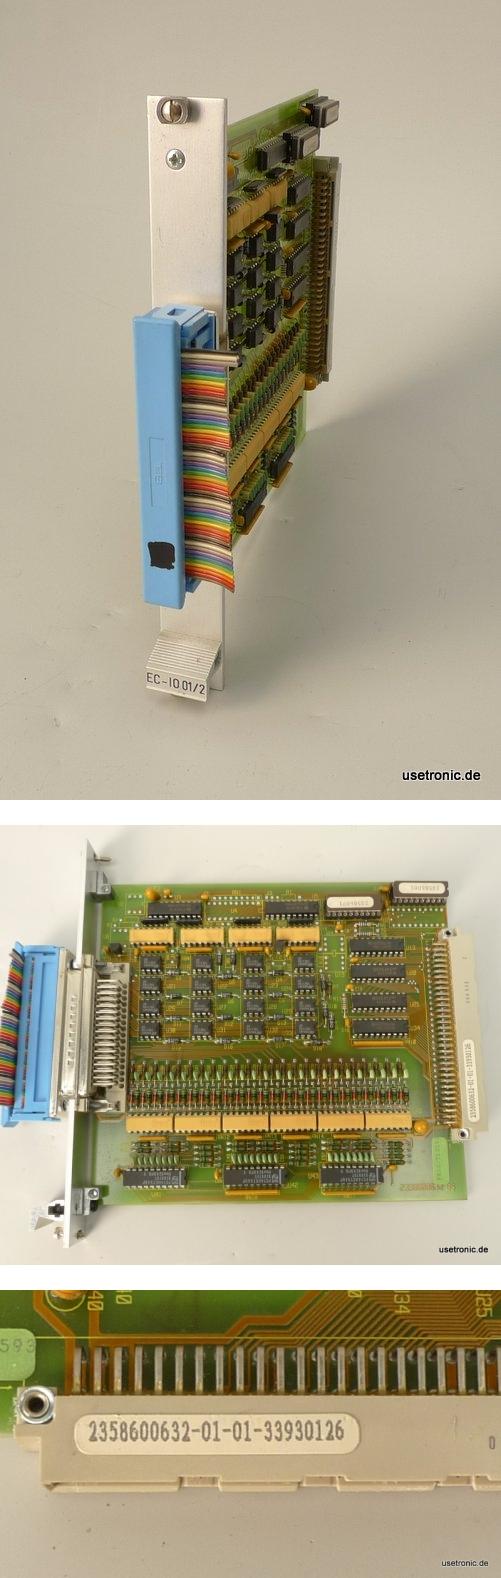 Eckelmann MSR 20 EC-10 01/02 2358600632-01-01-33930126